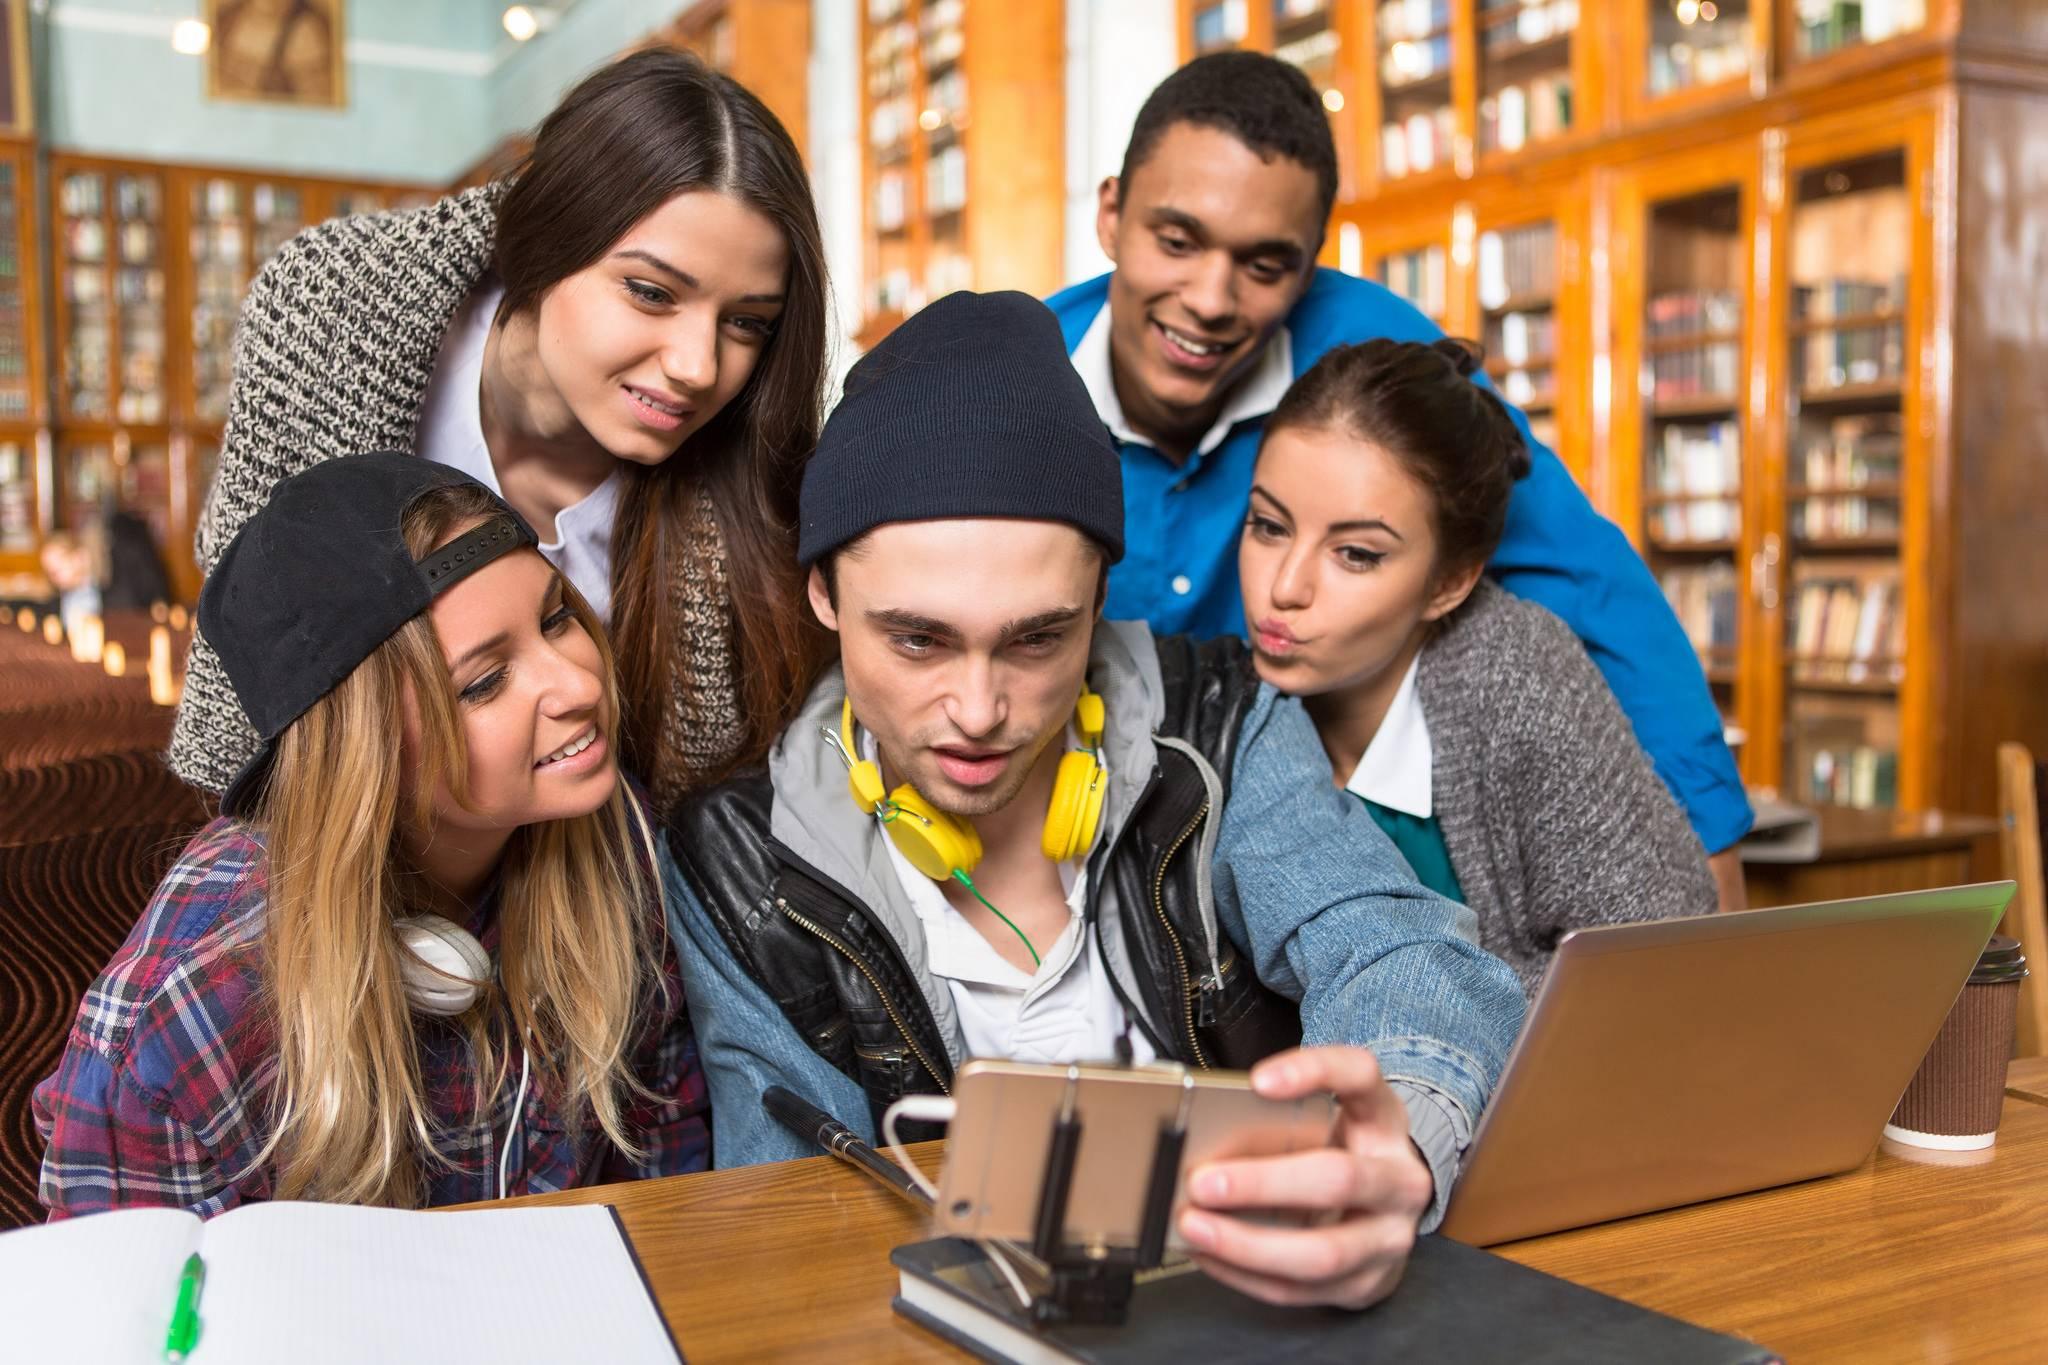 adolescents-smartphone